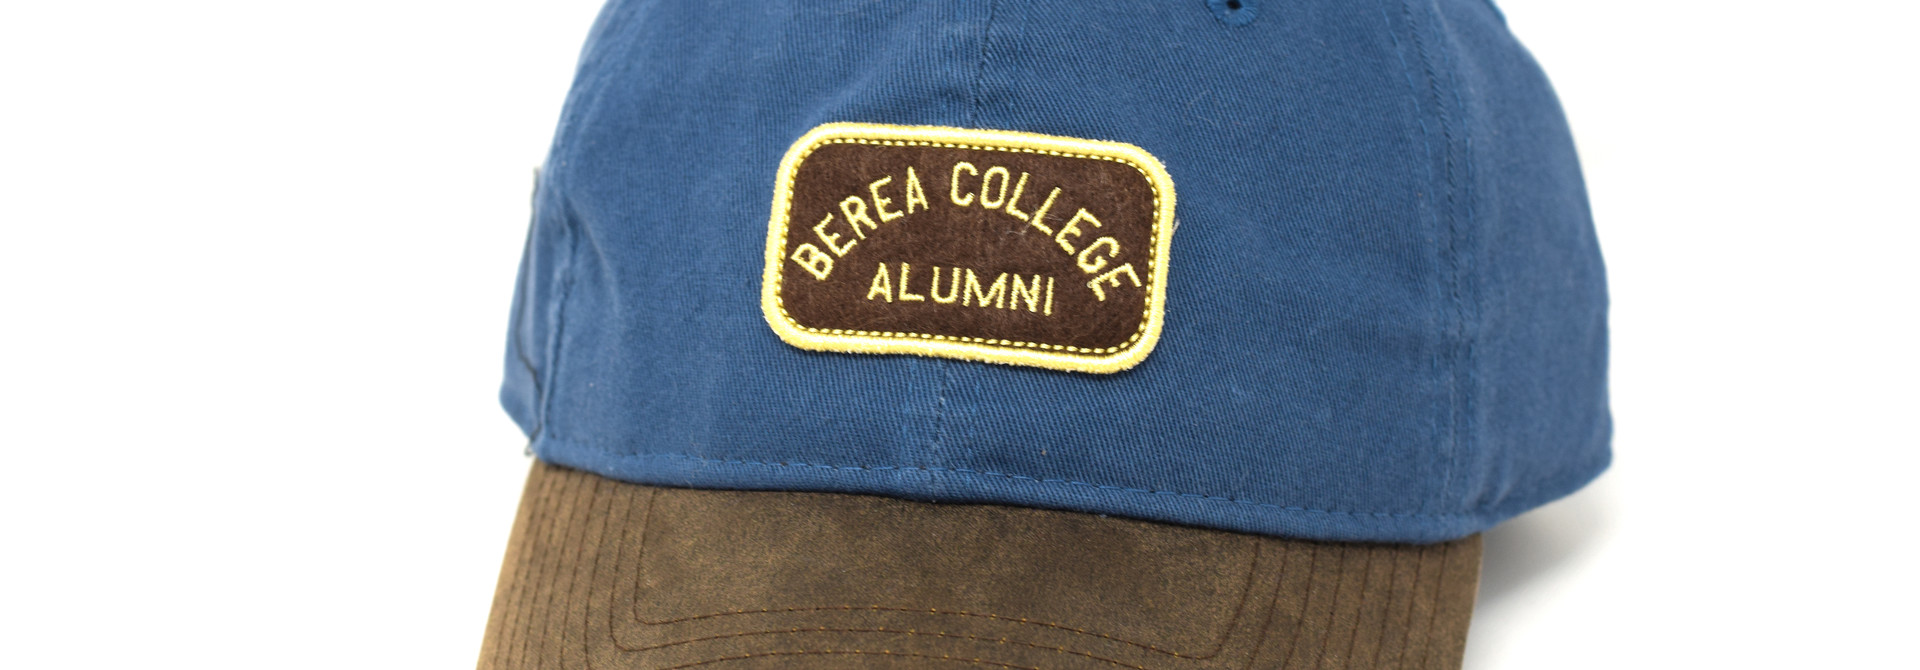 Berea College Alumni Ball Cap